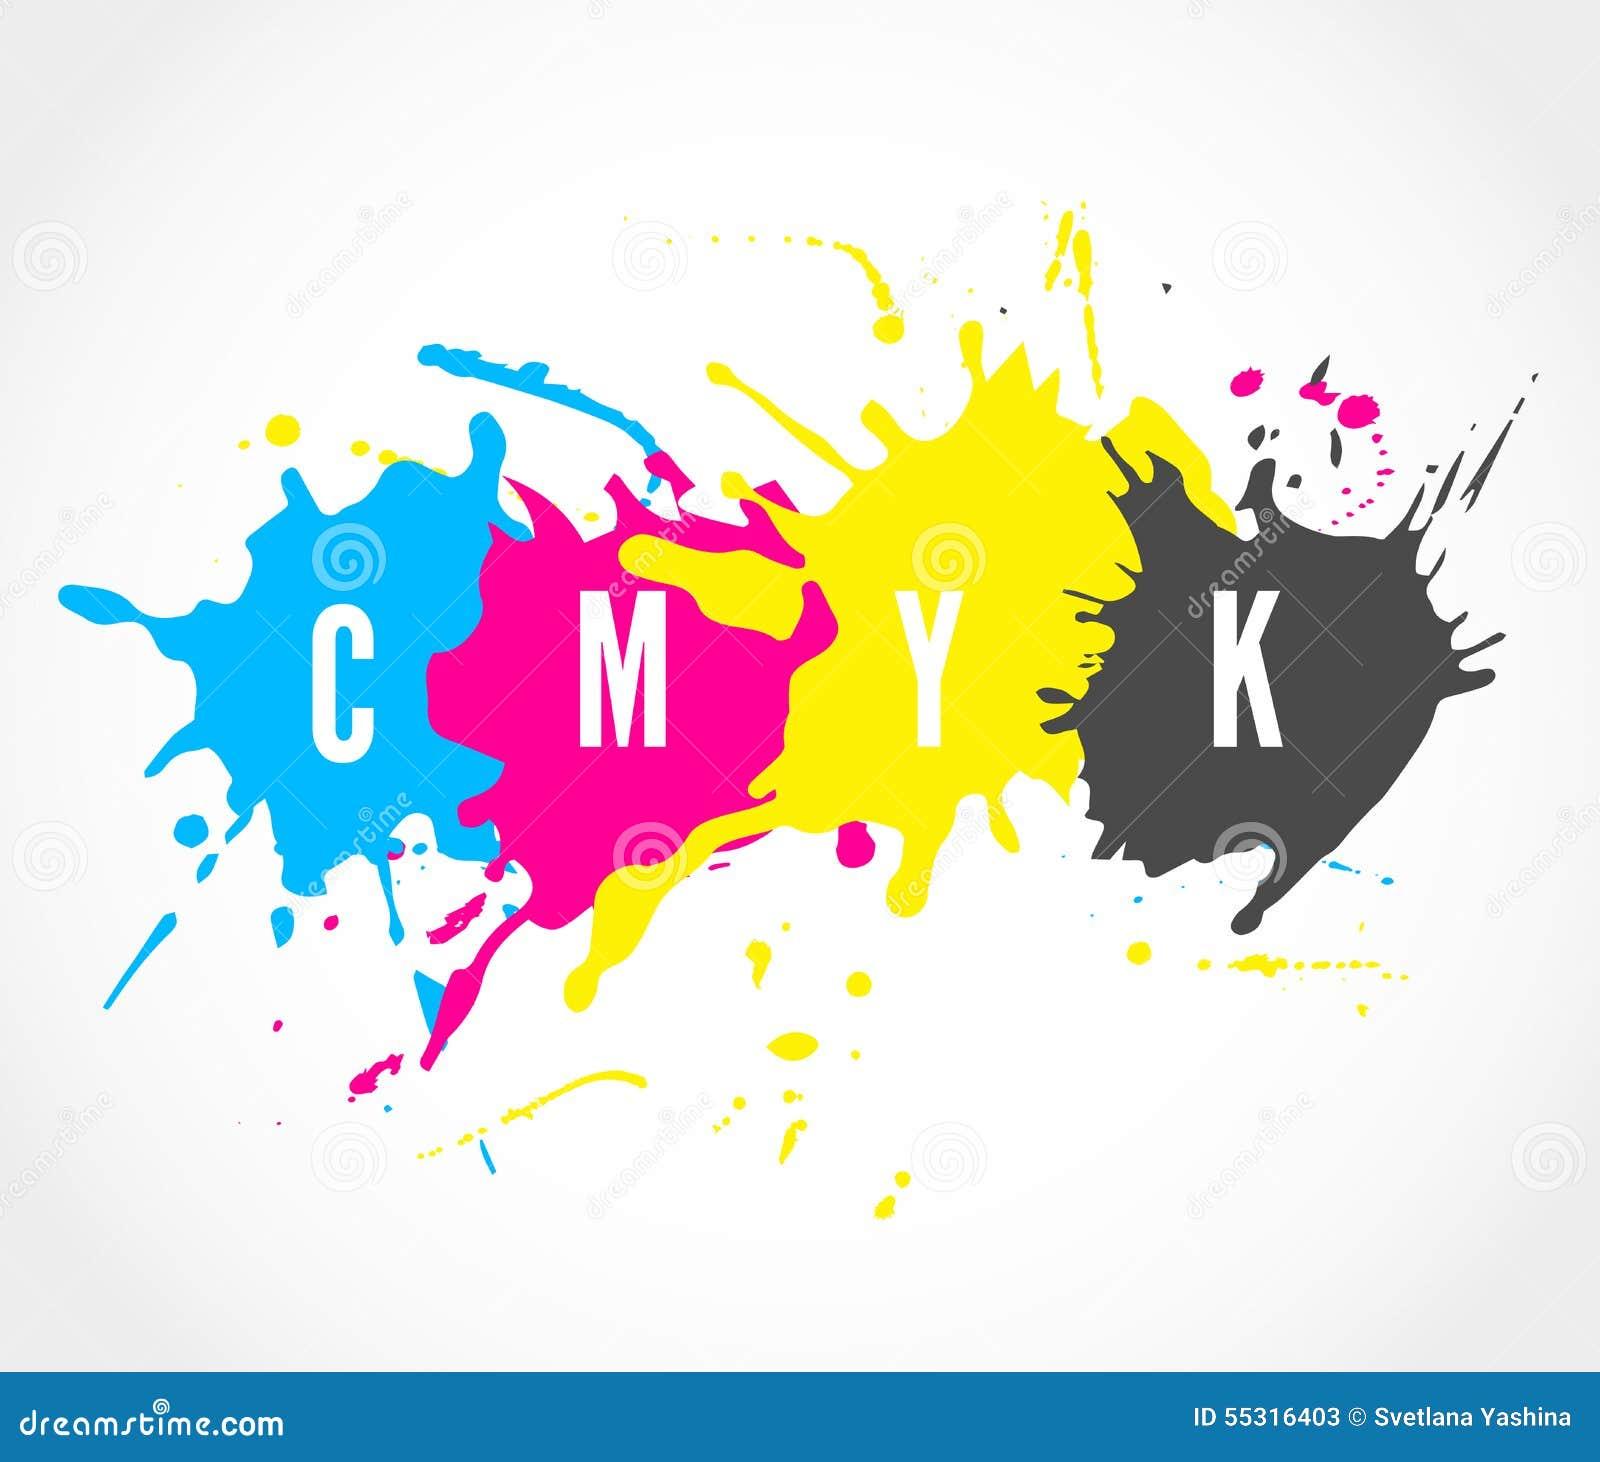 CMYK Ink Splashes Logo Stock Vector